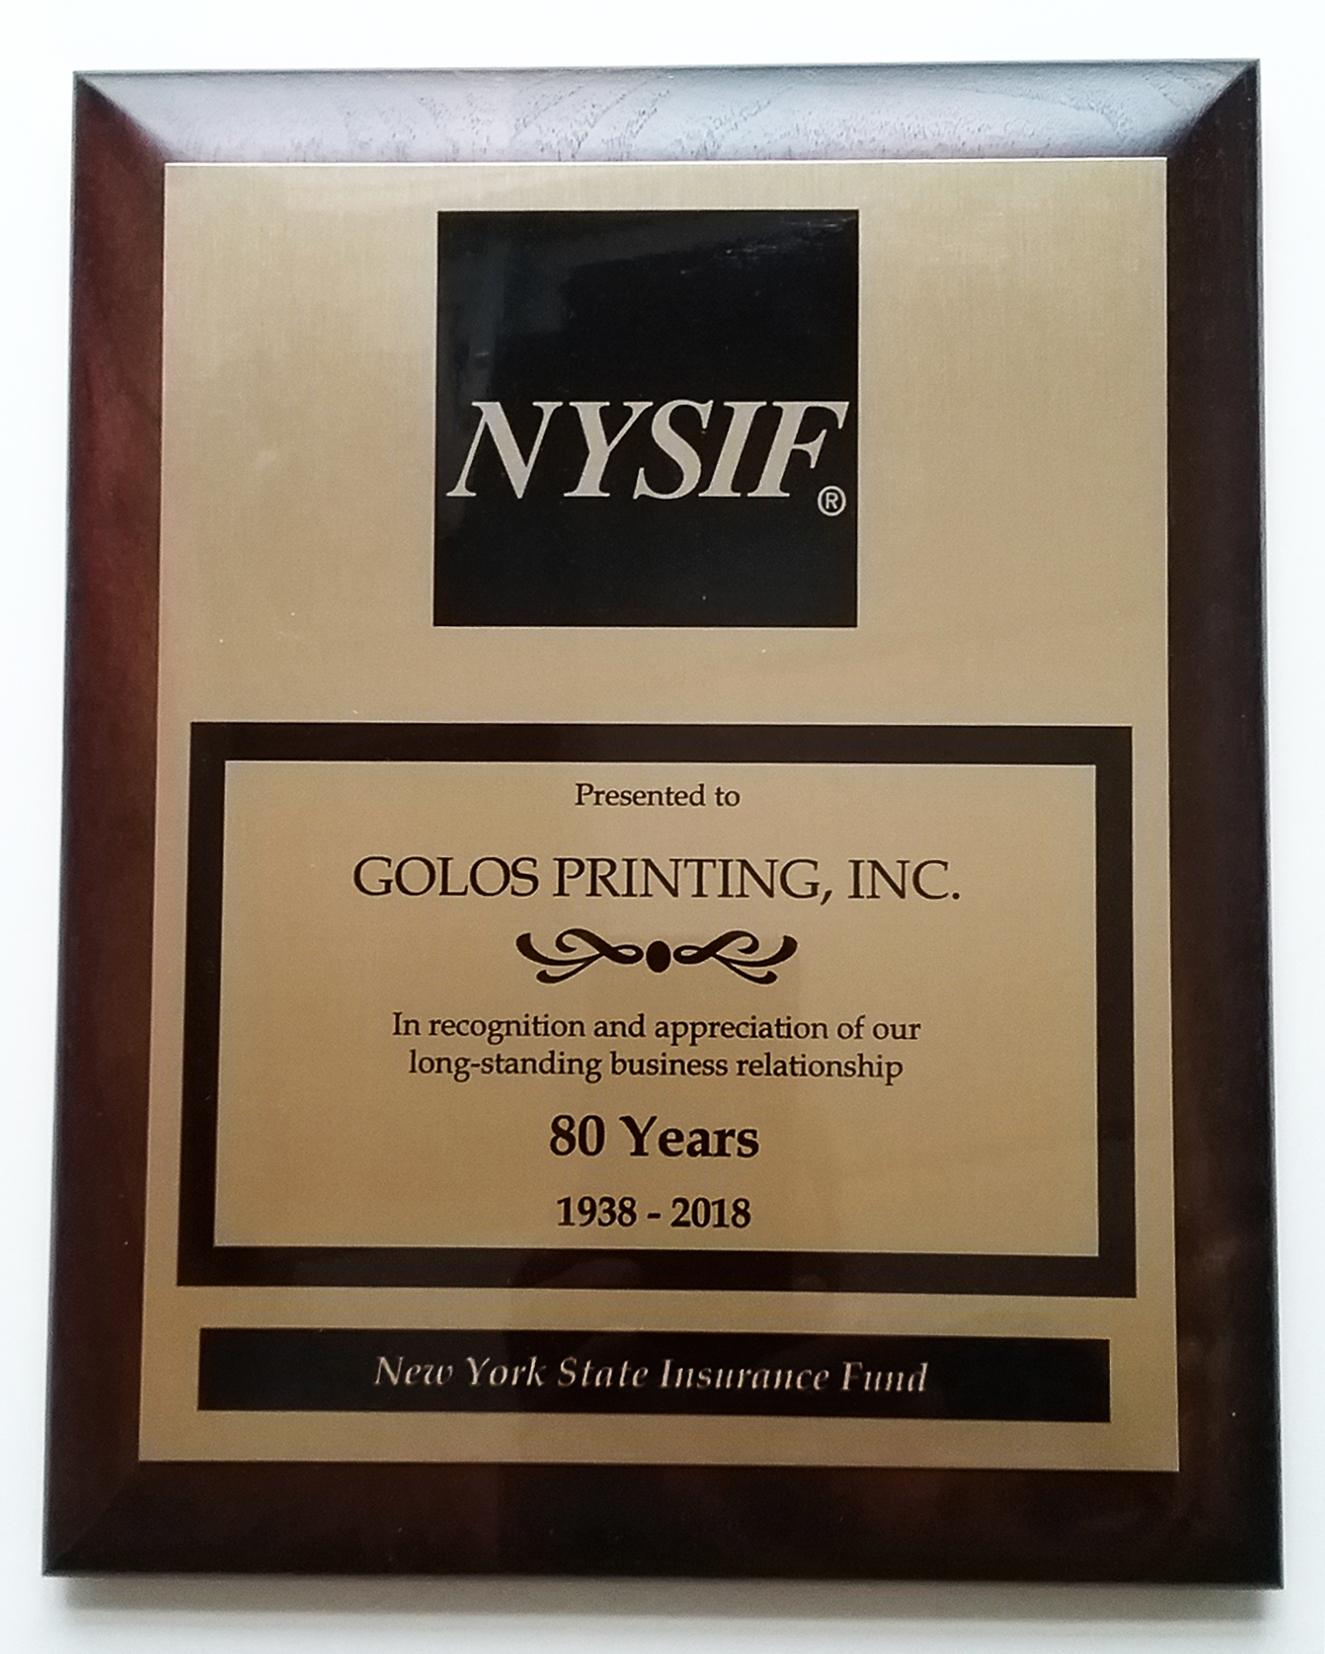 NYSIF Plaque